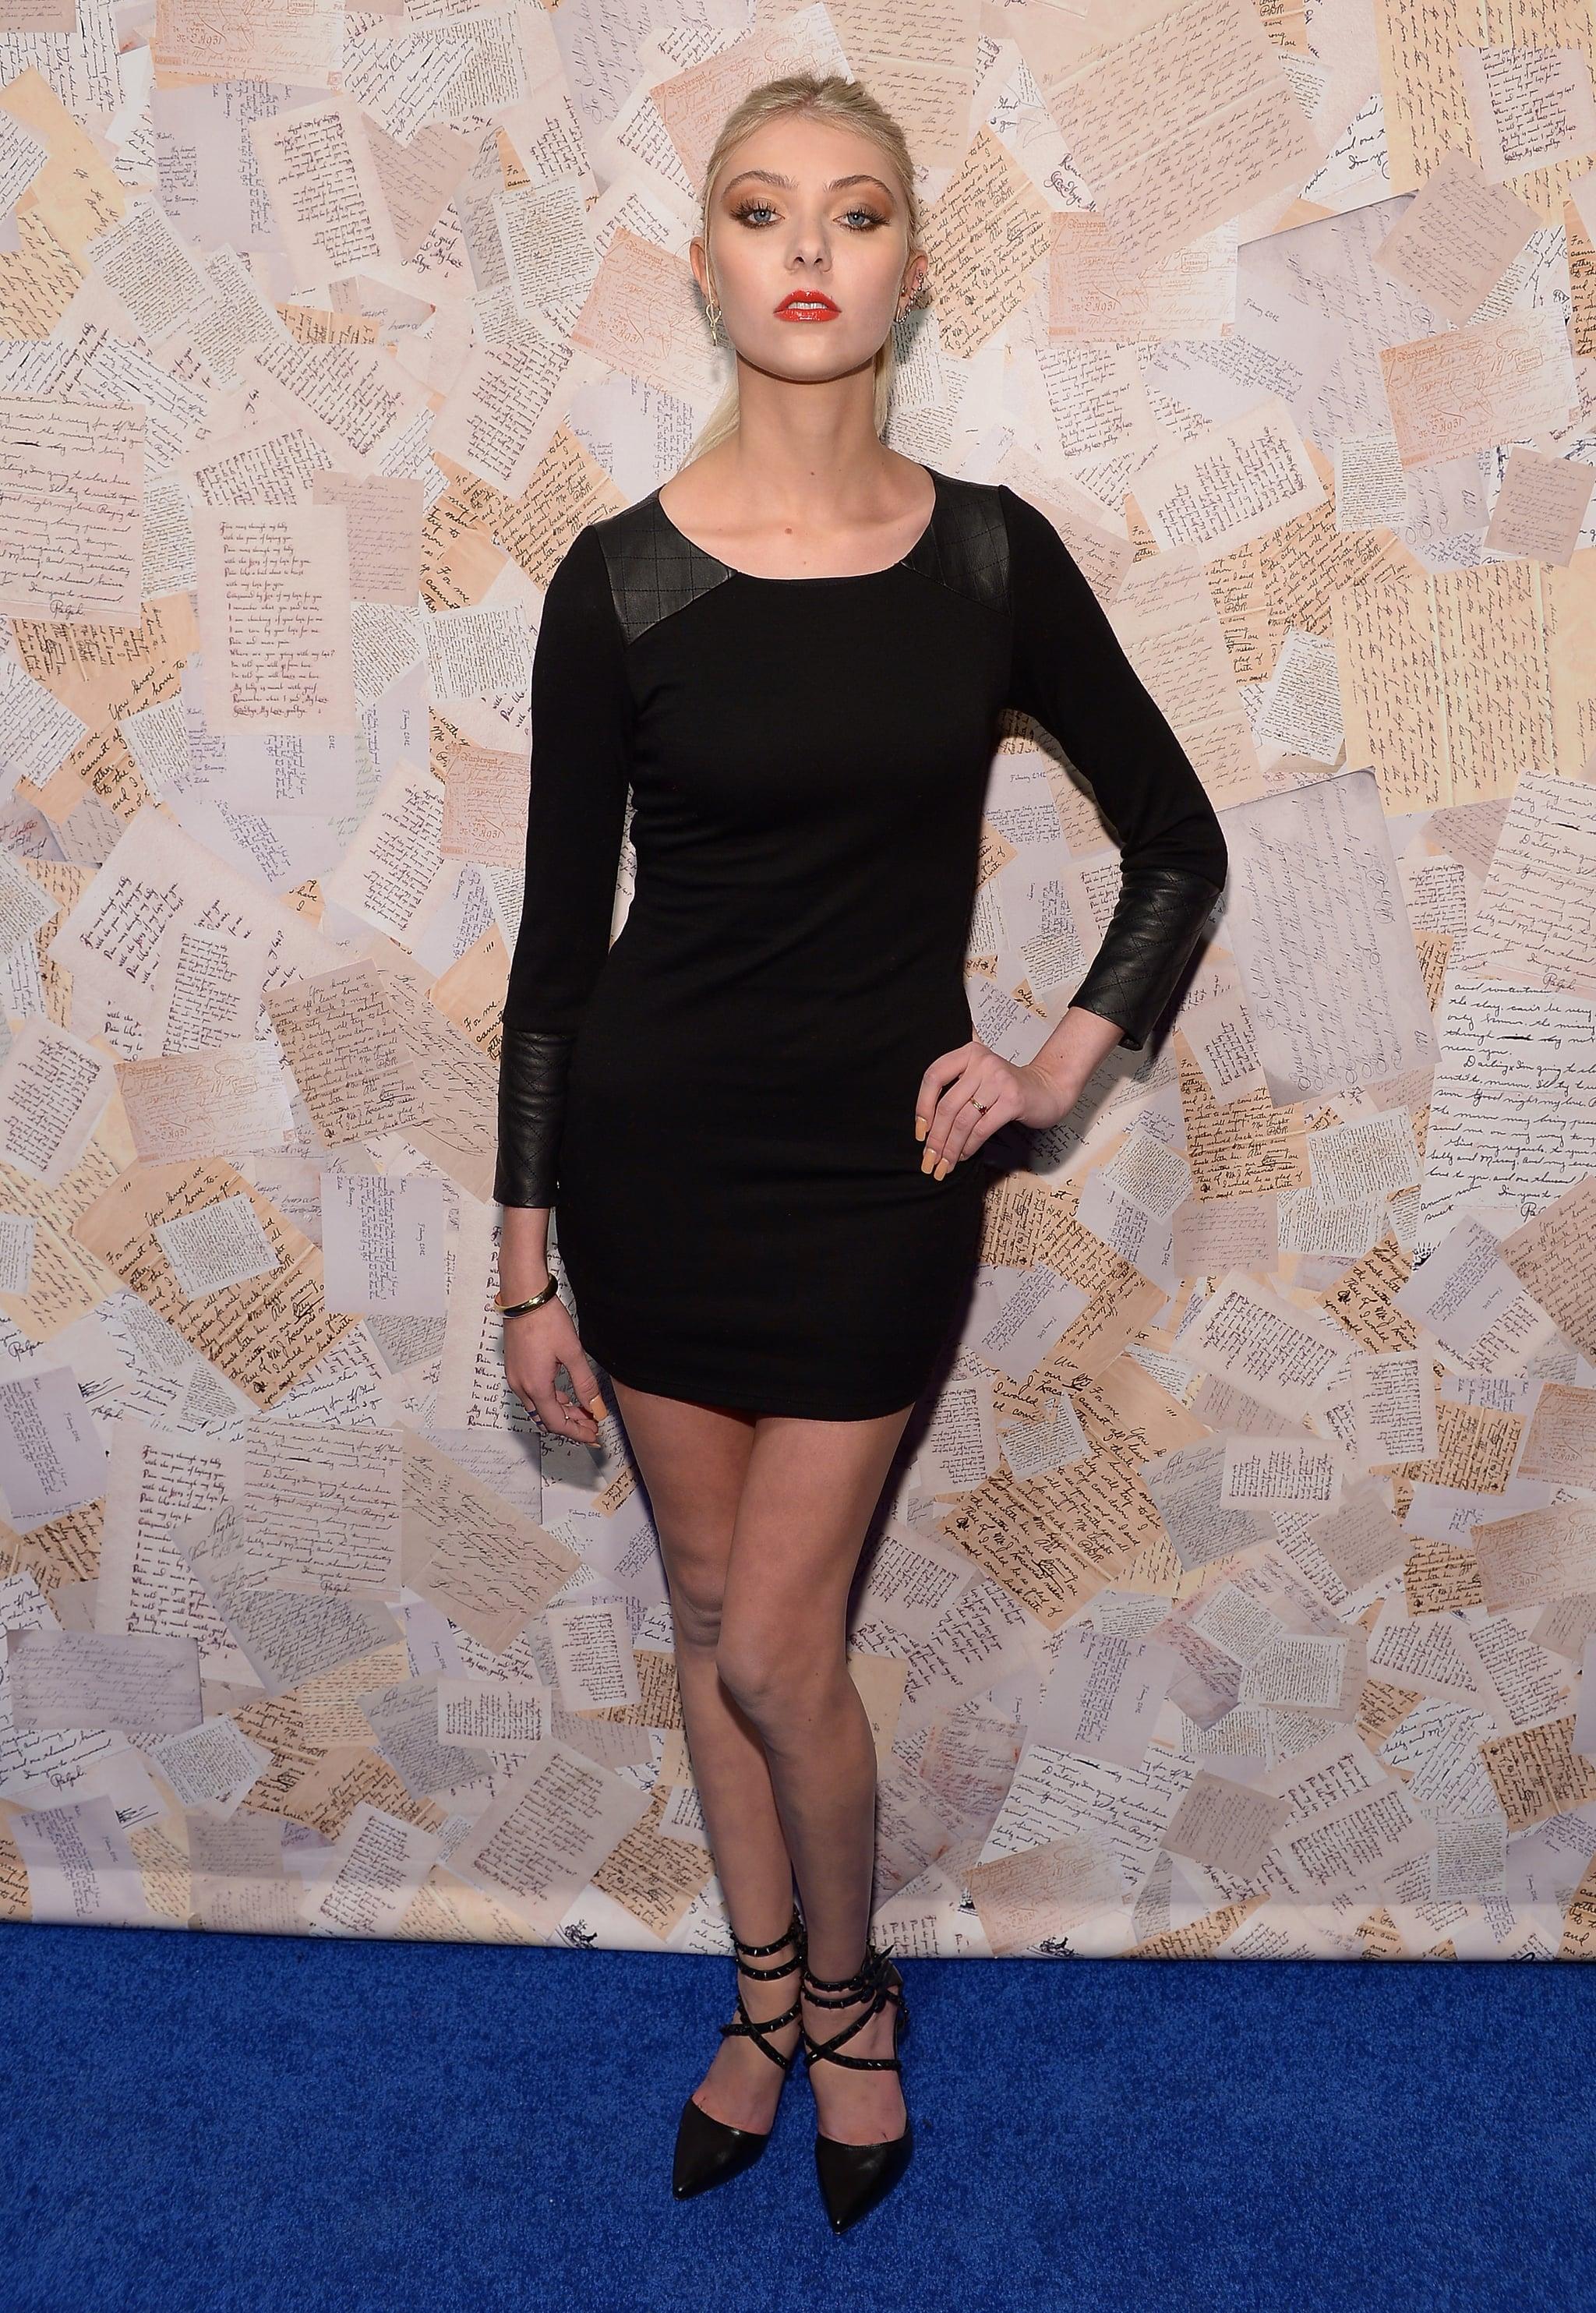 Taylor Momsen put her svelte figure on display in a little black Alice + Olivia dress and strappy pumps at the designer's presentation.